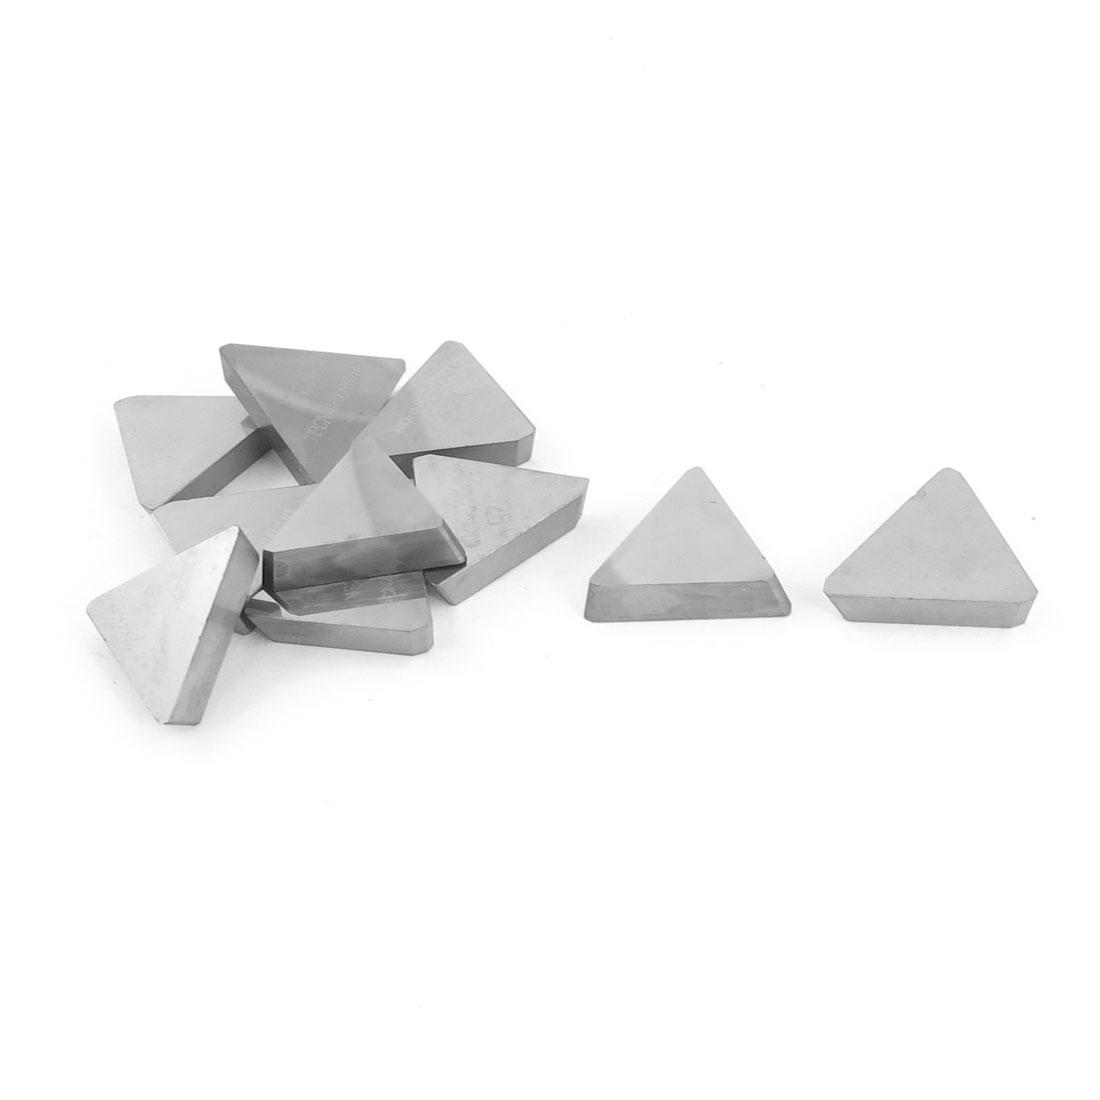 10pcs Milling Brazing Turning Lathe Tool Carbide Insert Tip YS25 TPCN2204EDR